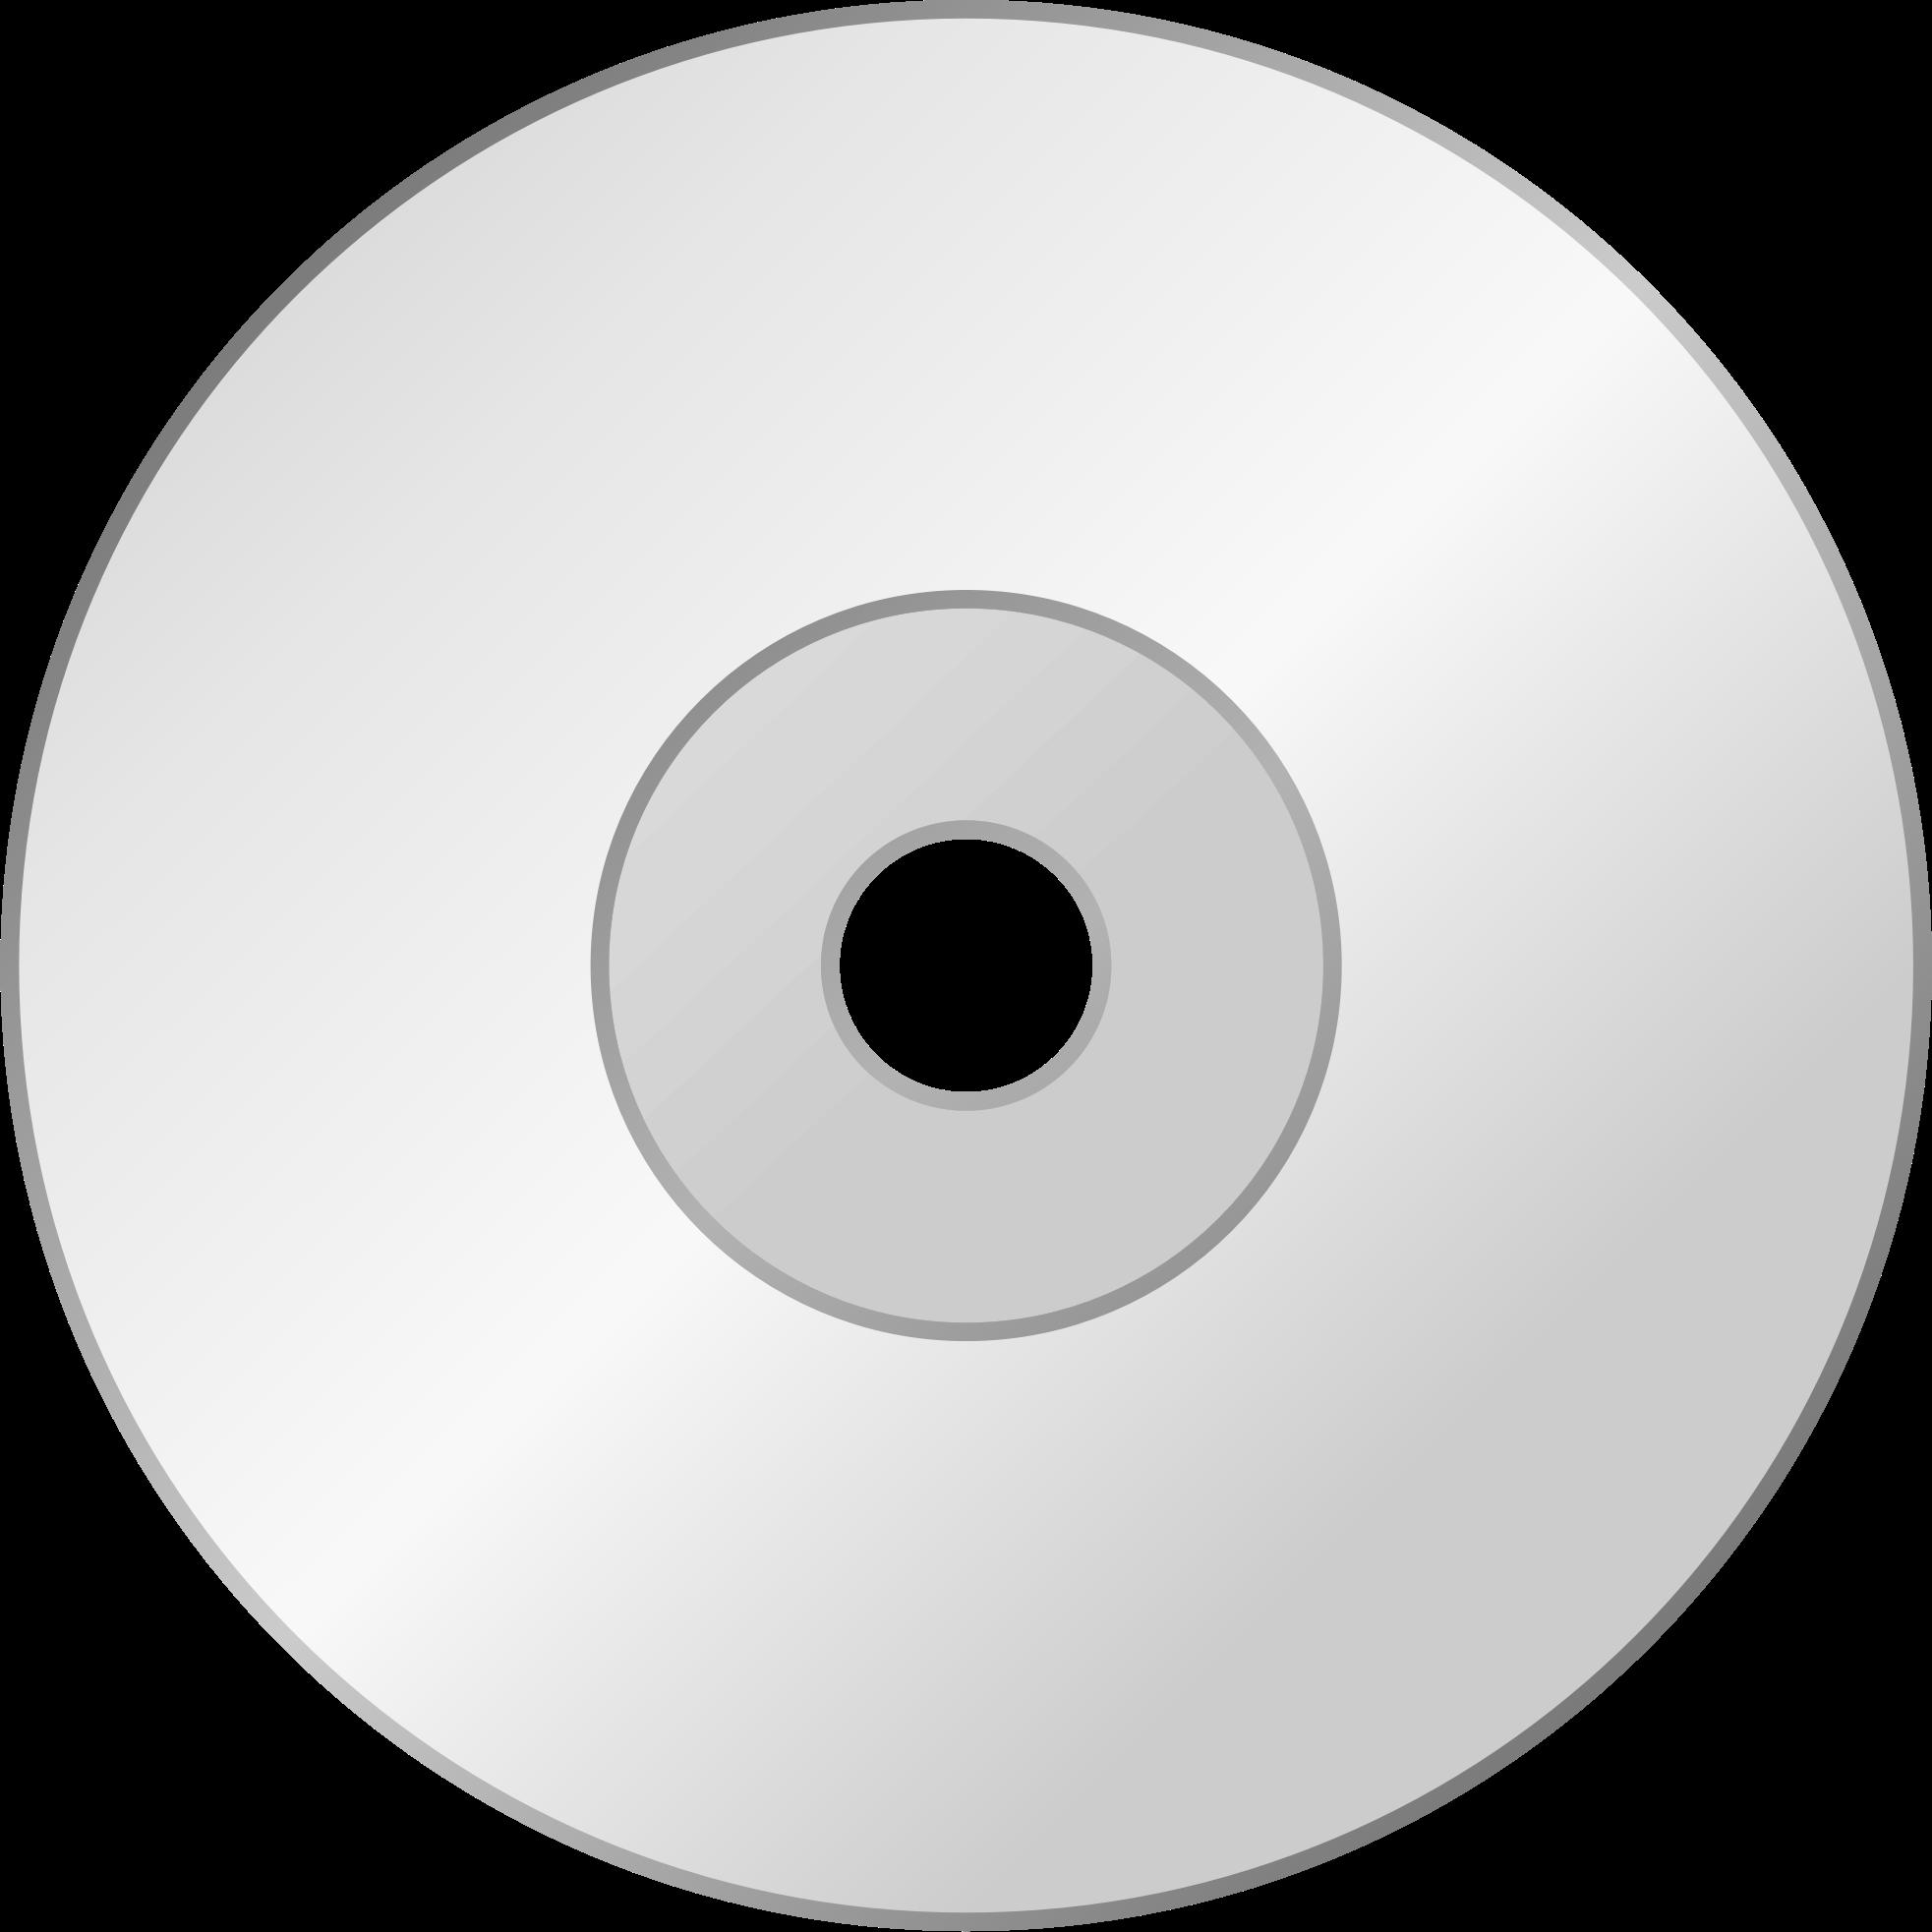 cd clipart transparent background